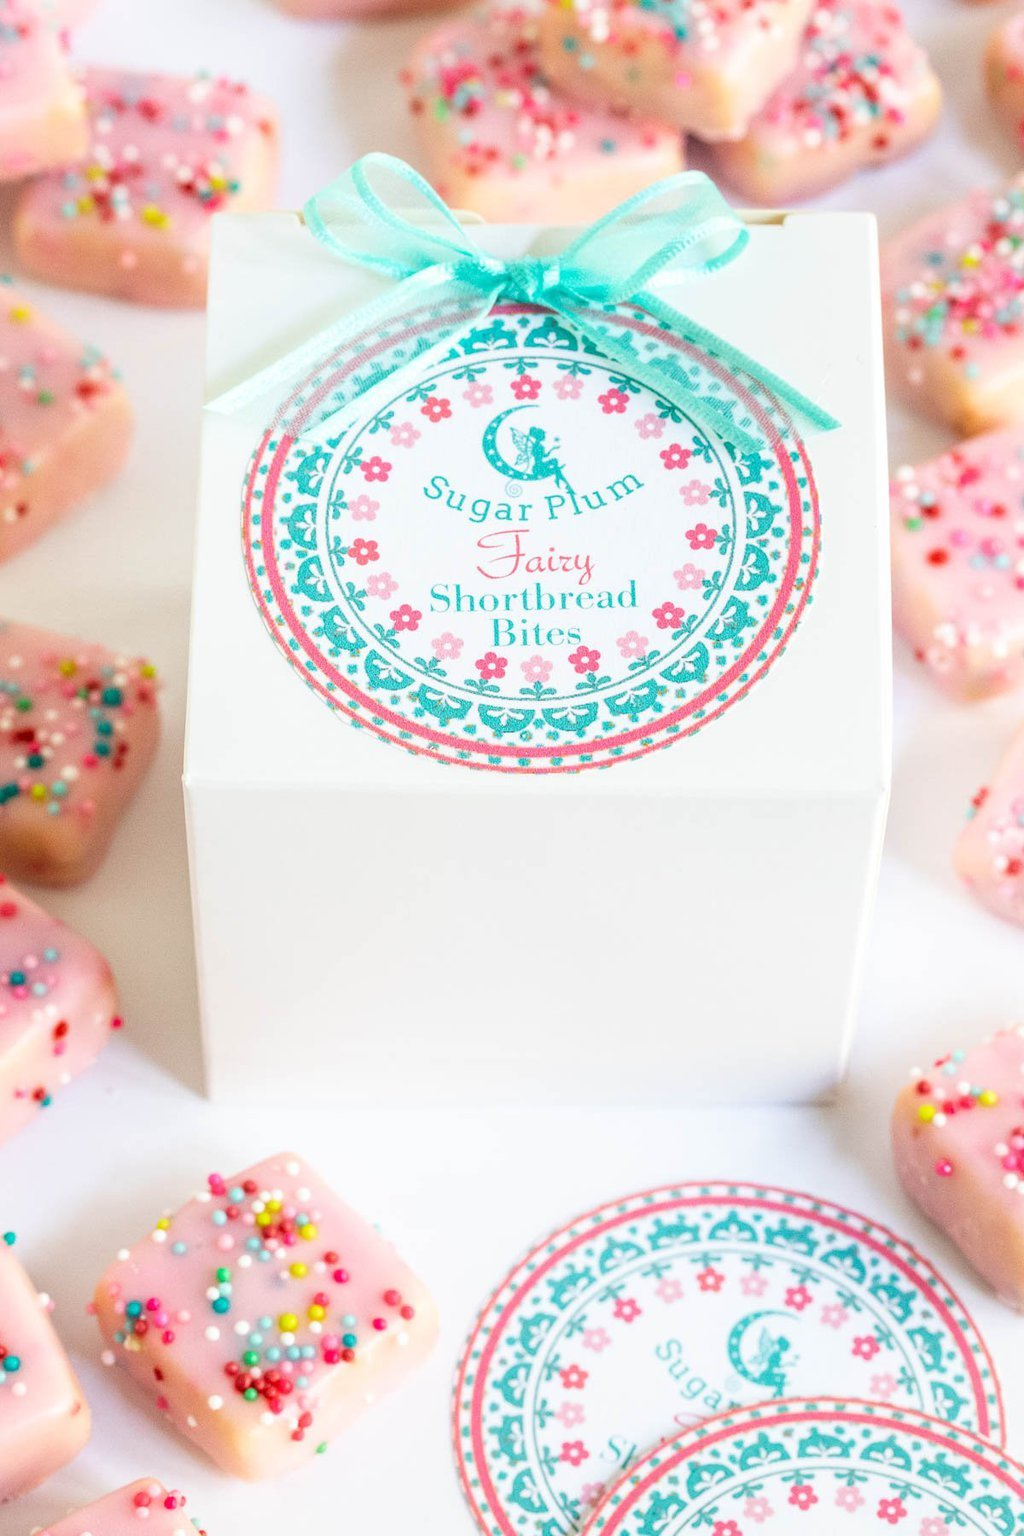 Vertical closeup photo of Sugar Plum Fairy Shortbread Bite custom gift labels and boxes.